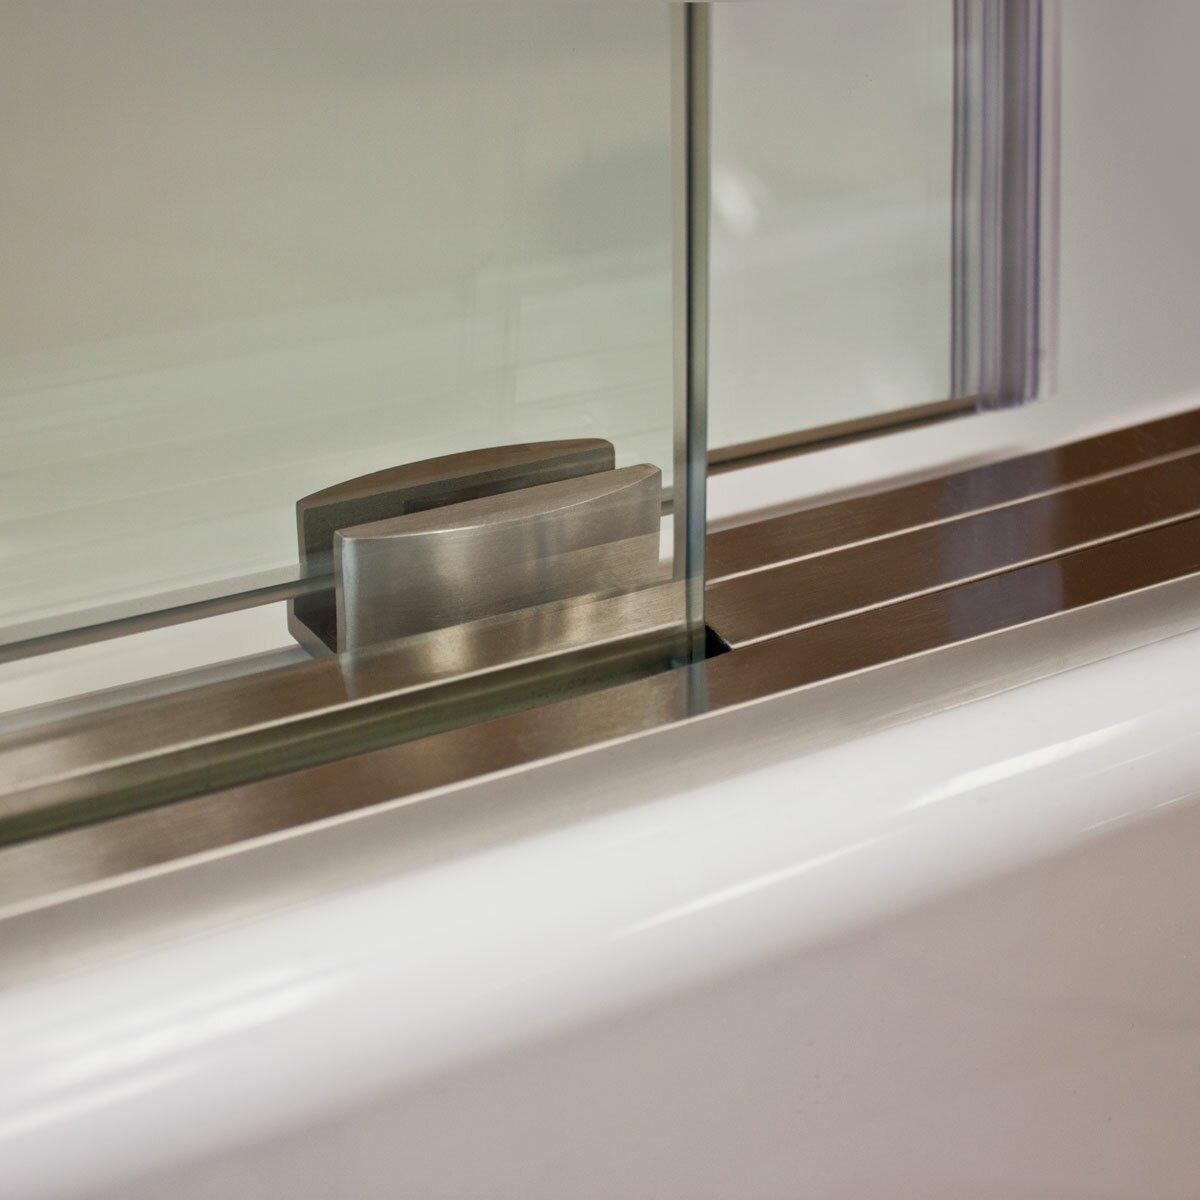 Lesscare ultra d 48 x 36 x 79 sliding high glass shower for Window 48 x 36